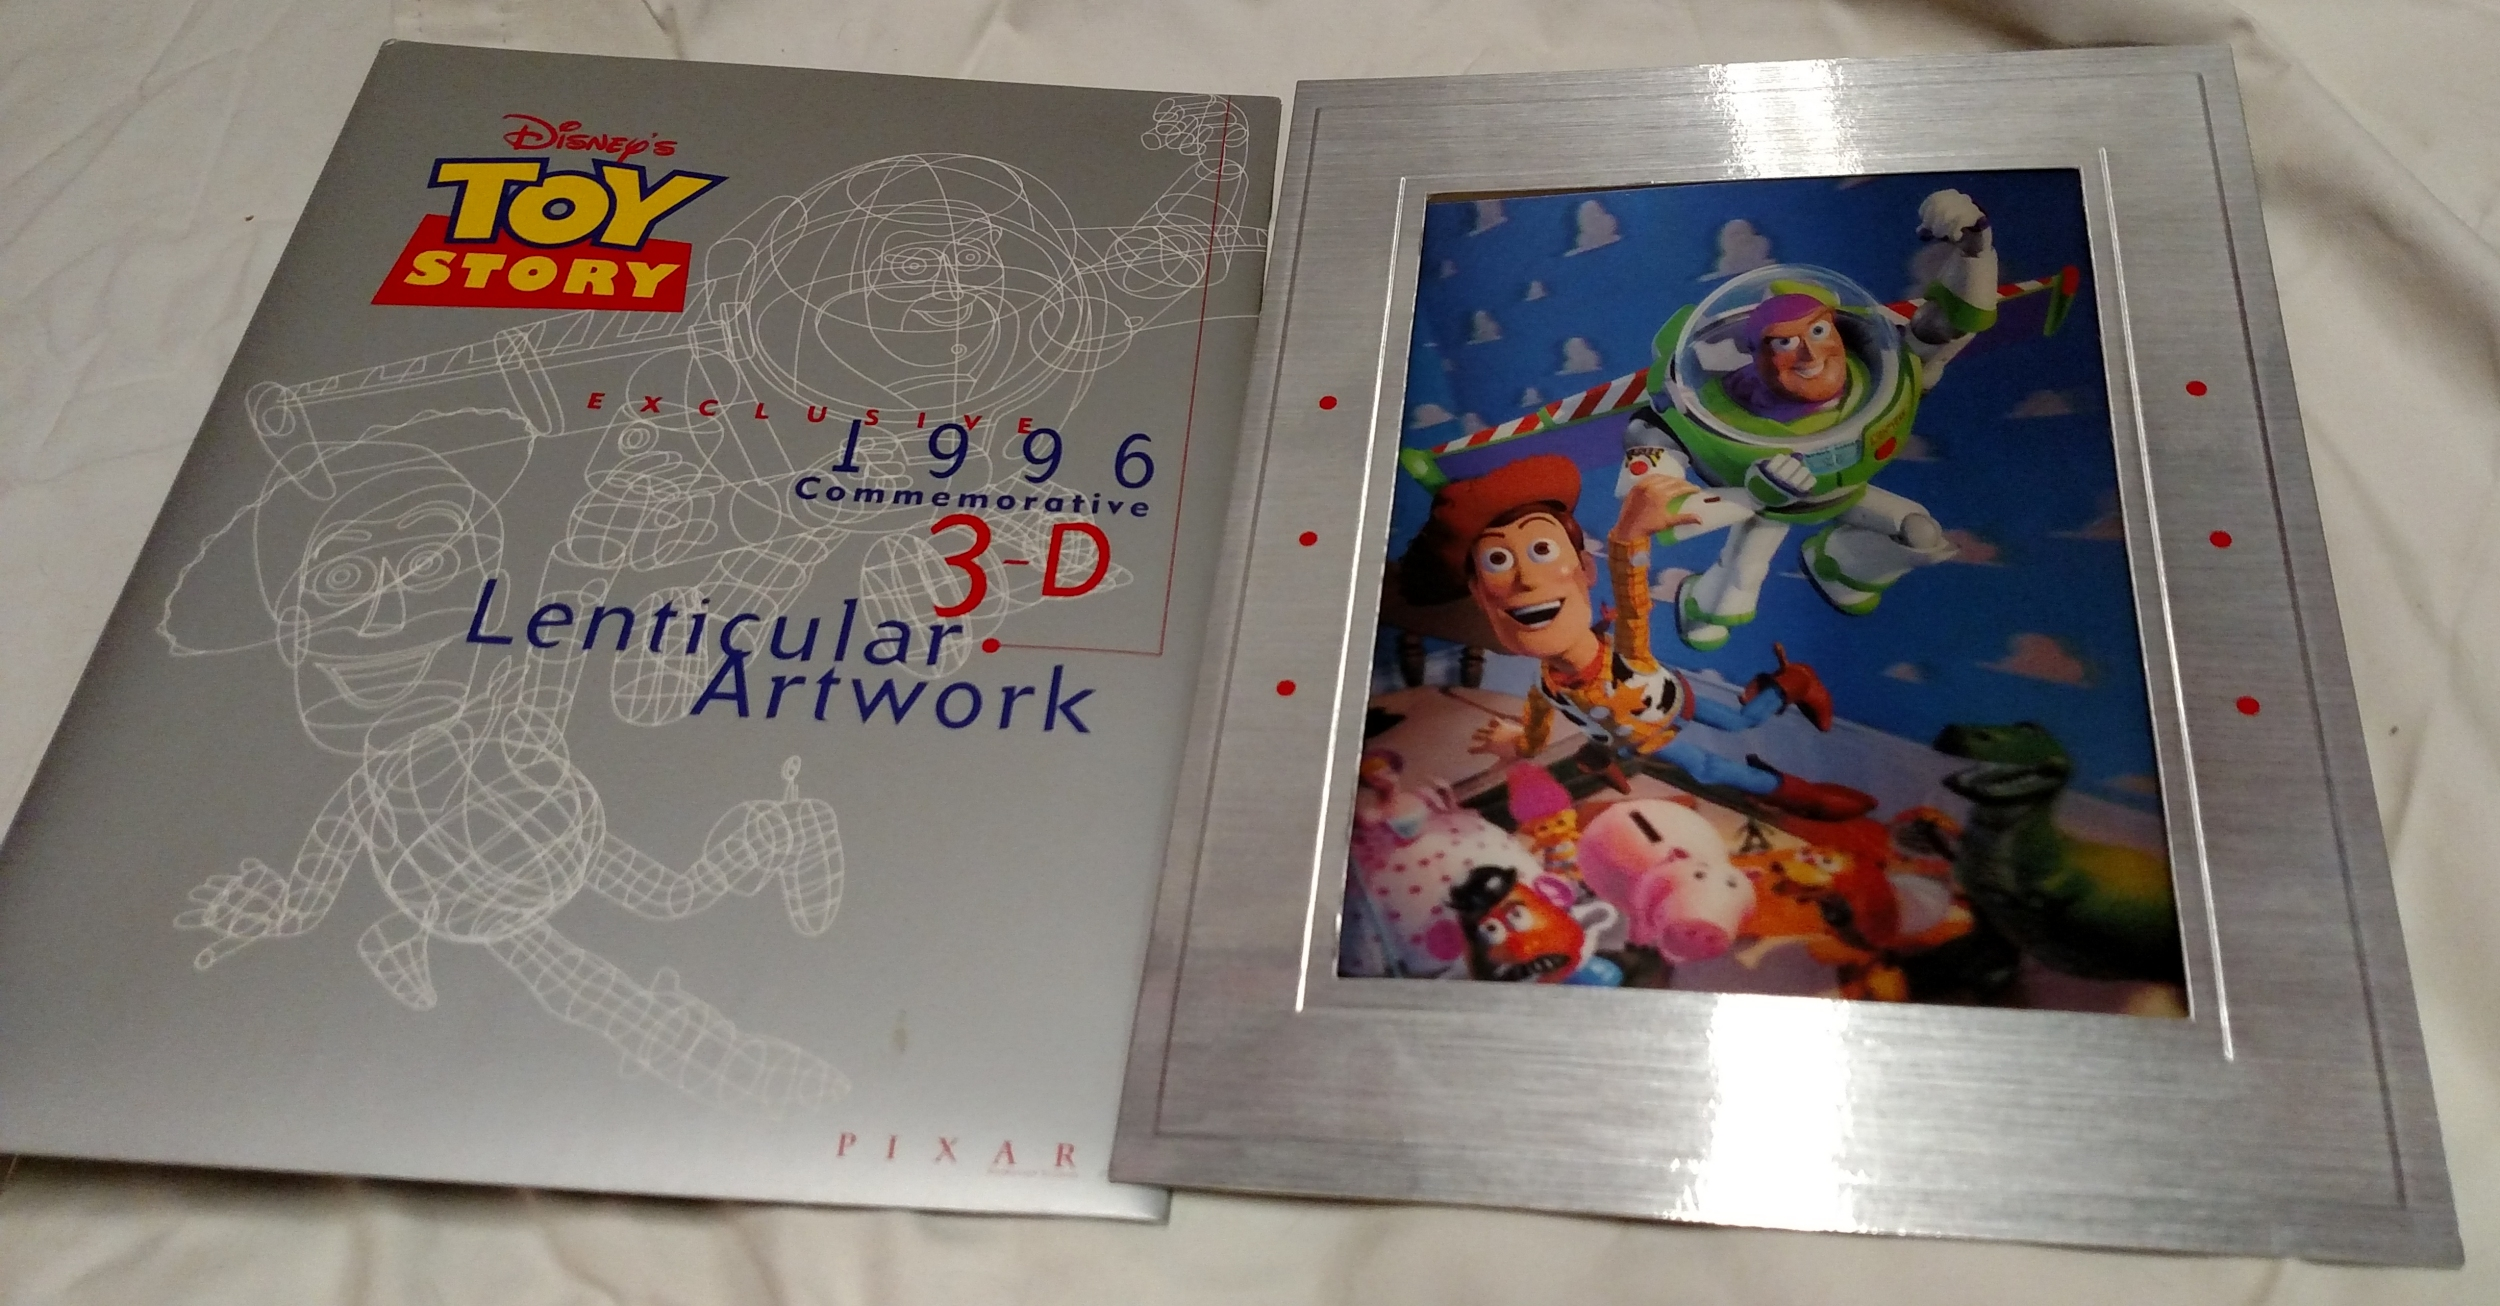 Toy Story Laserdisc - Lenticular Art